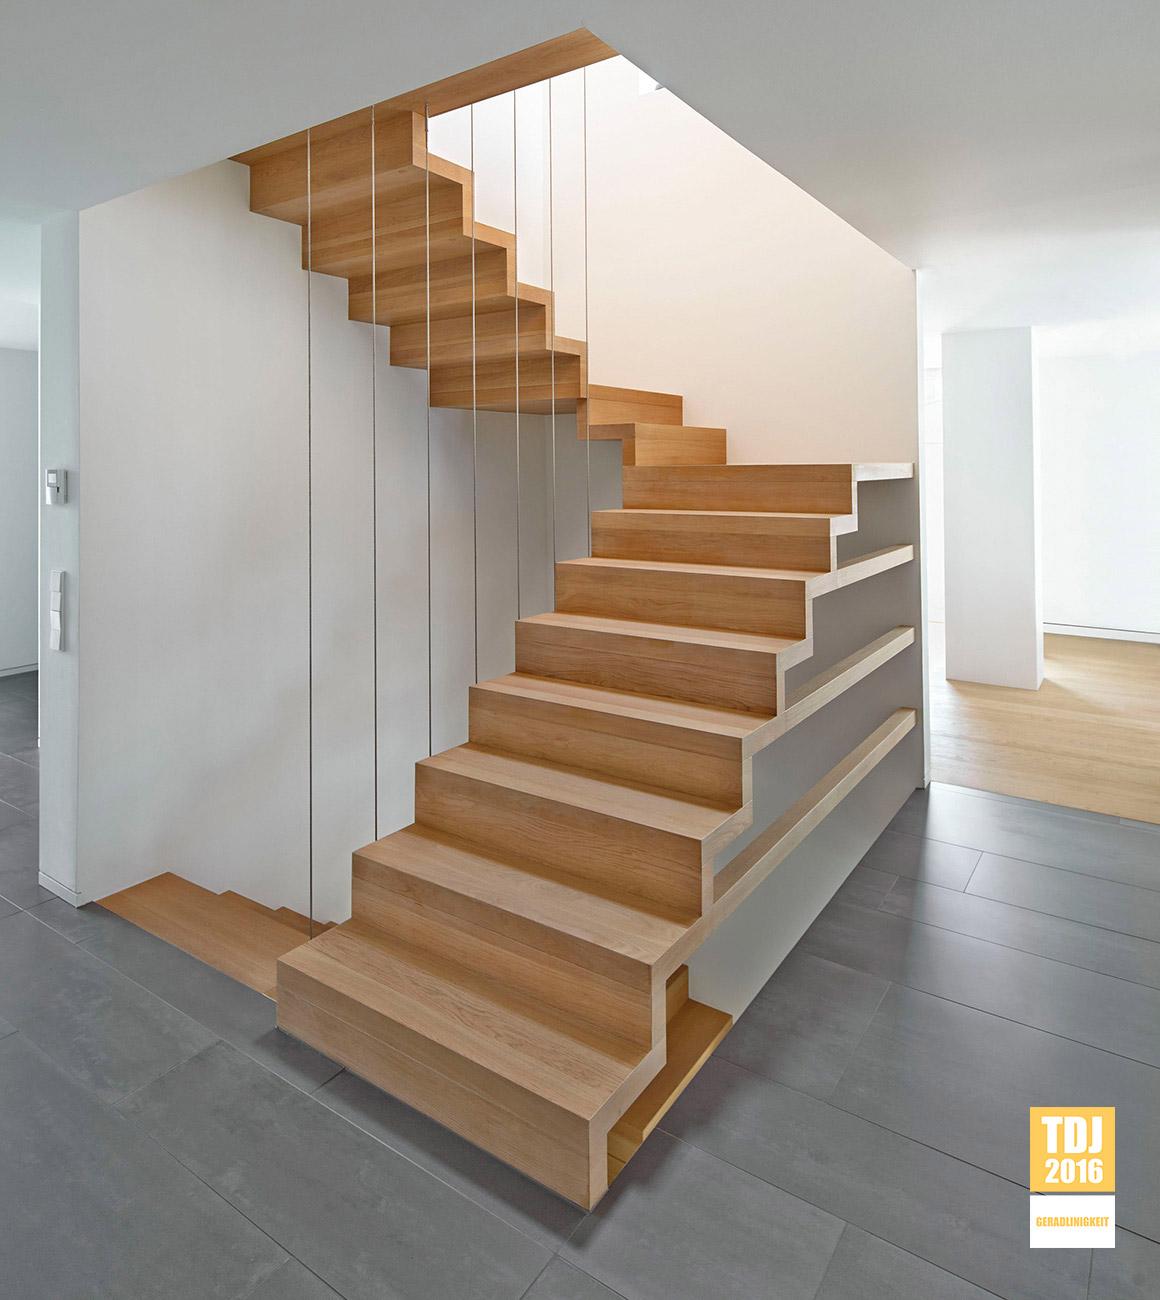 nett exklusives treppen design ideen die besten wohnideen. Black Bedroom Furniture Sets. Home Design Ideas